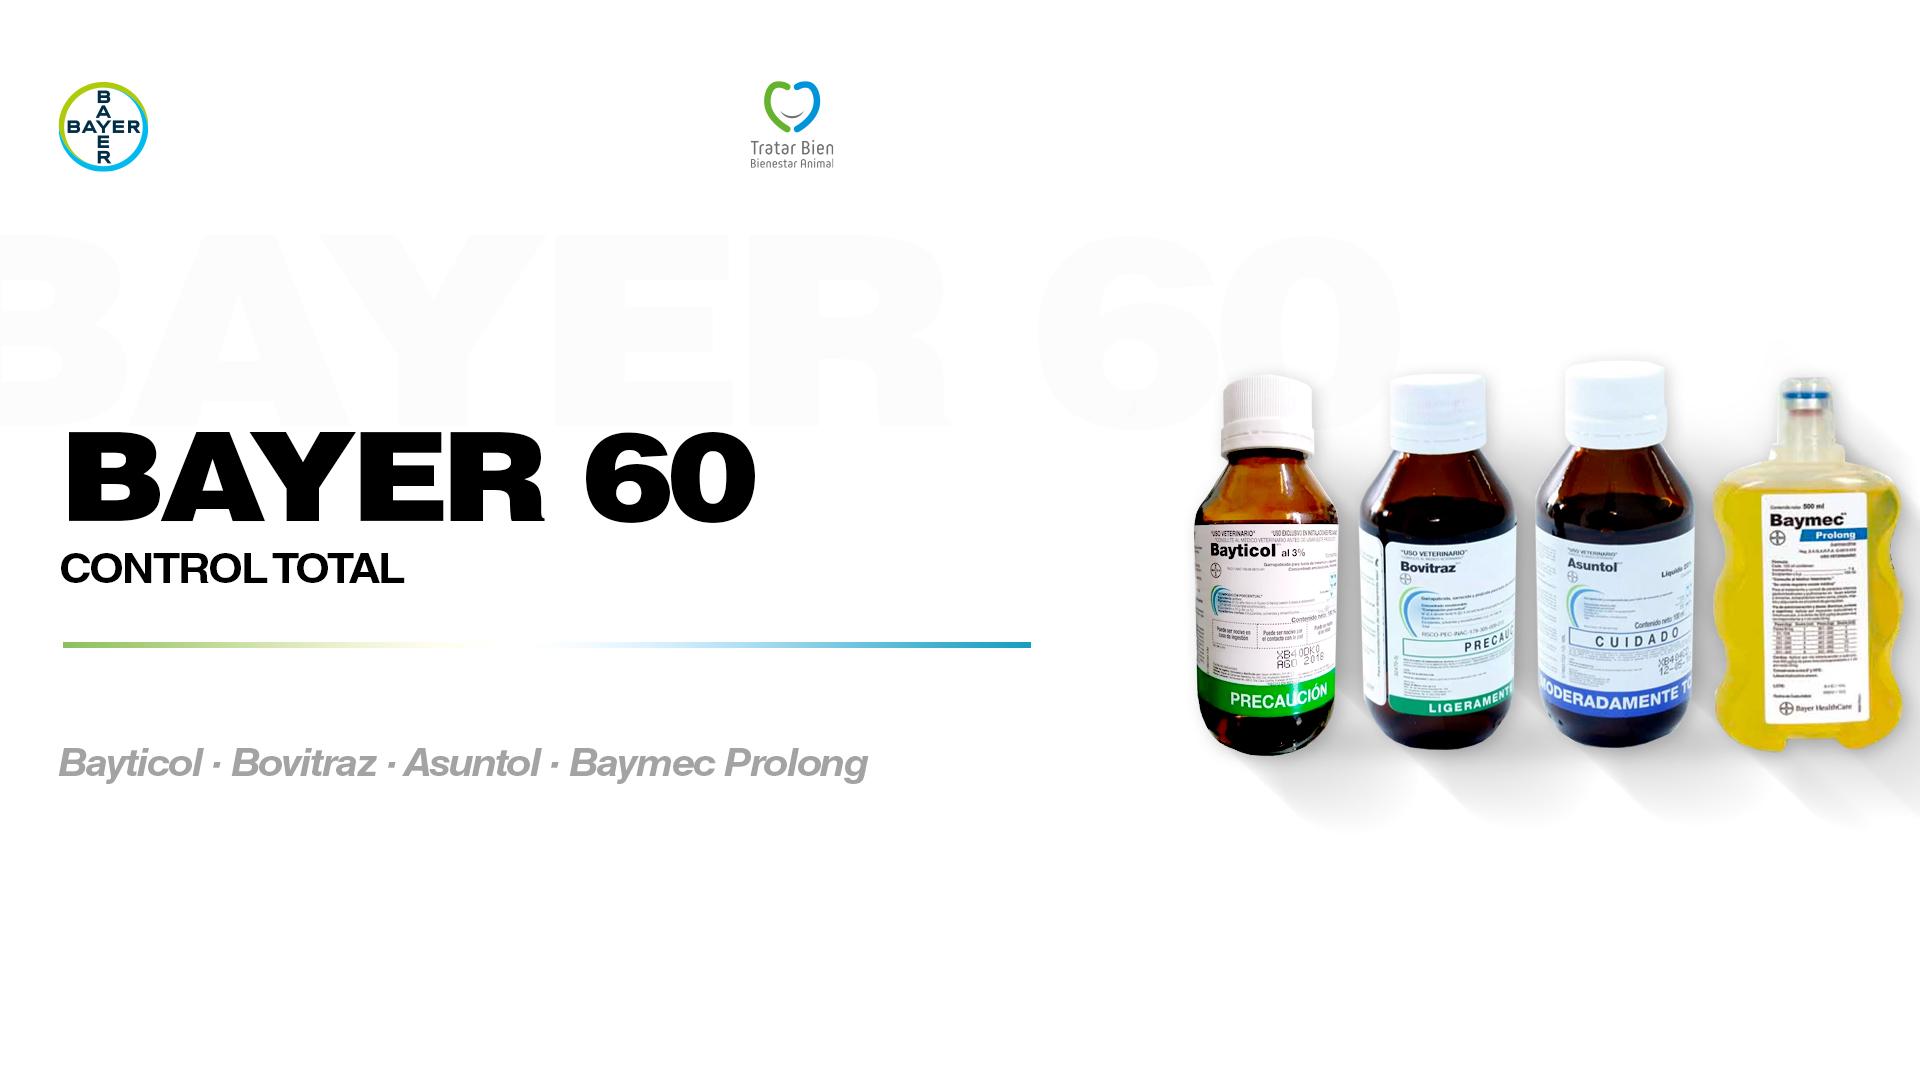 Bayer 60 Control Total: Garrapatas